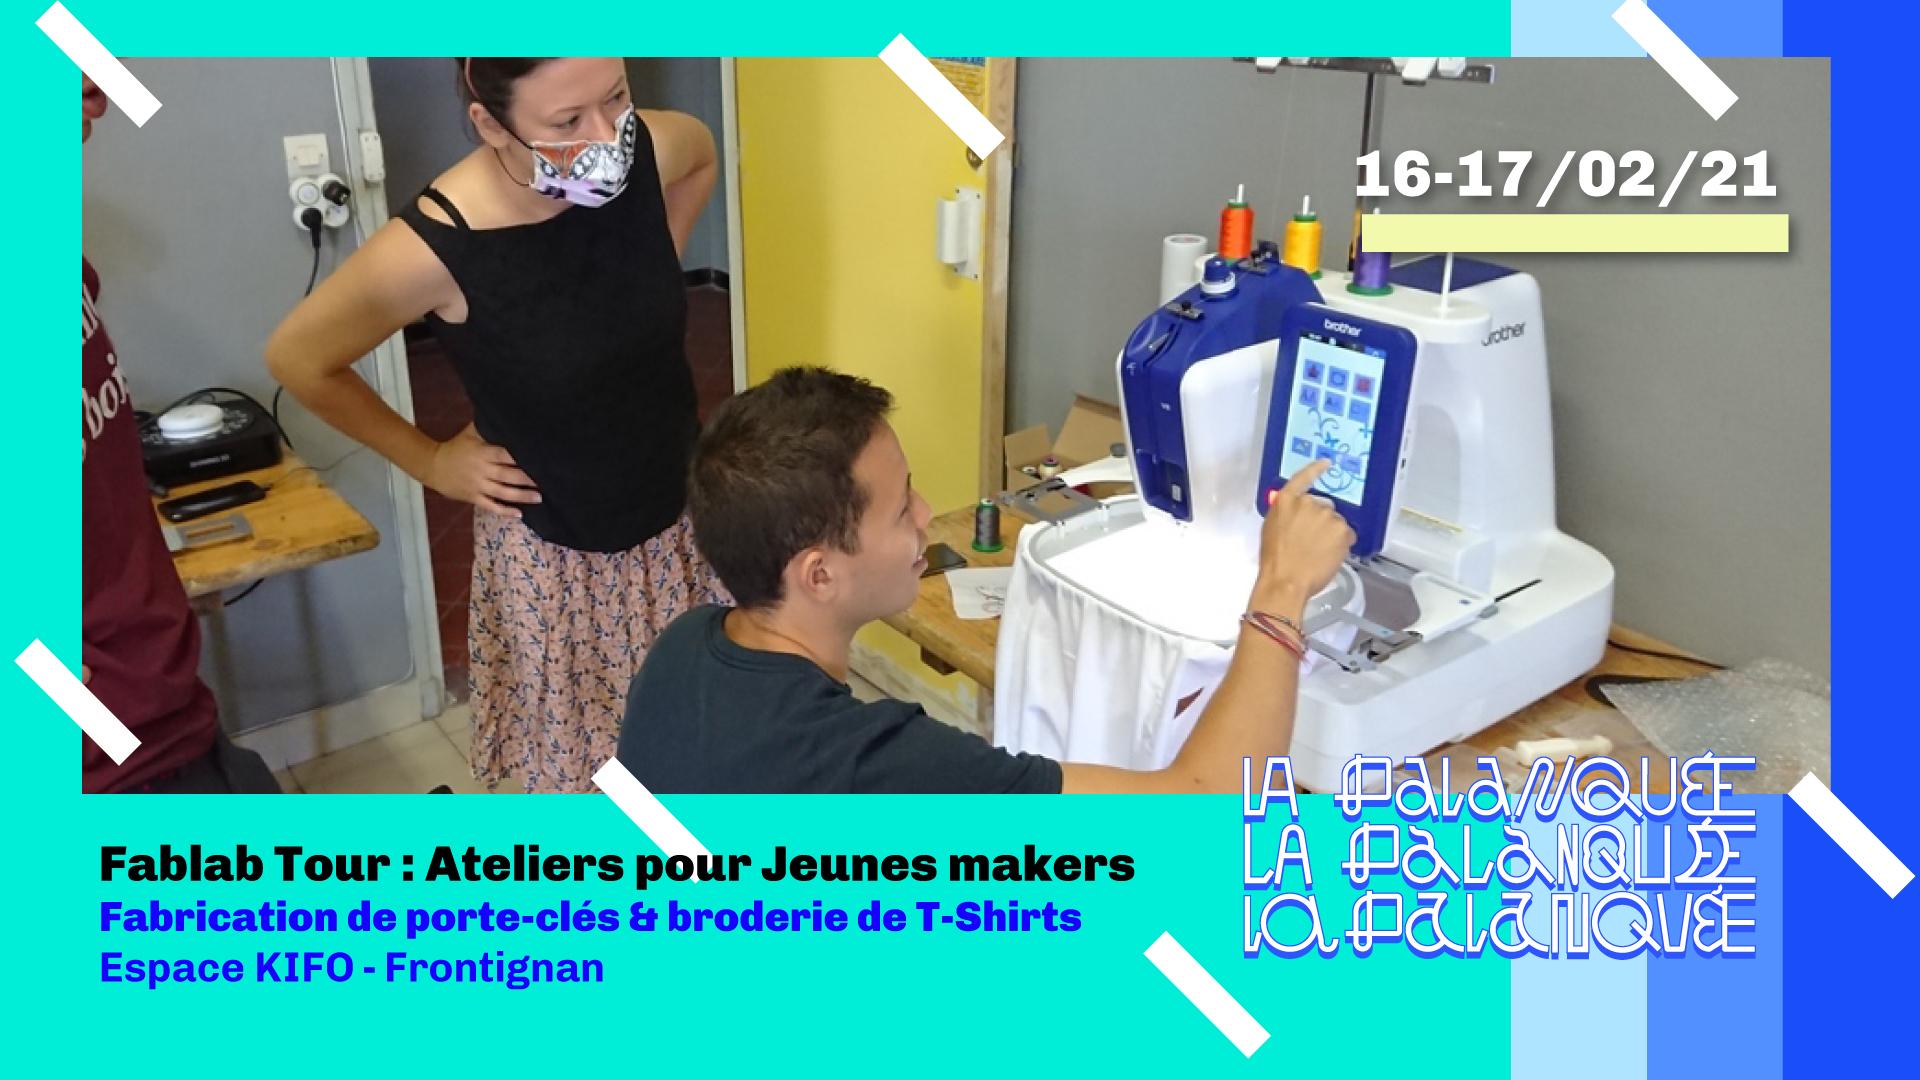 #FablabTour Frontignan : ateliers jeunes makers